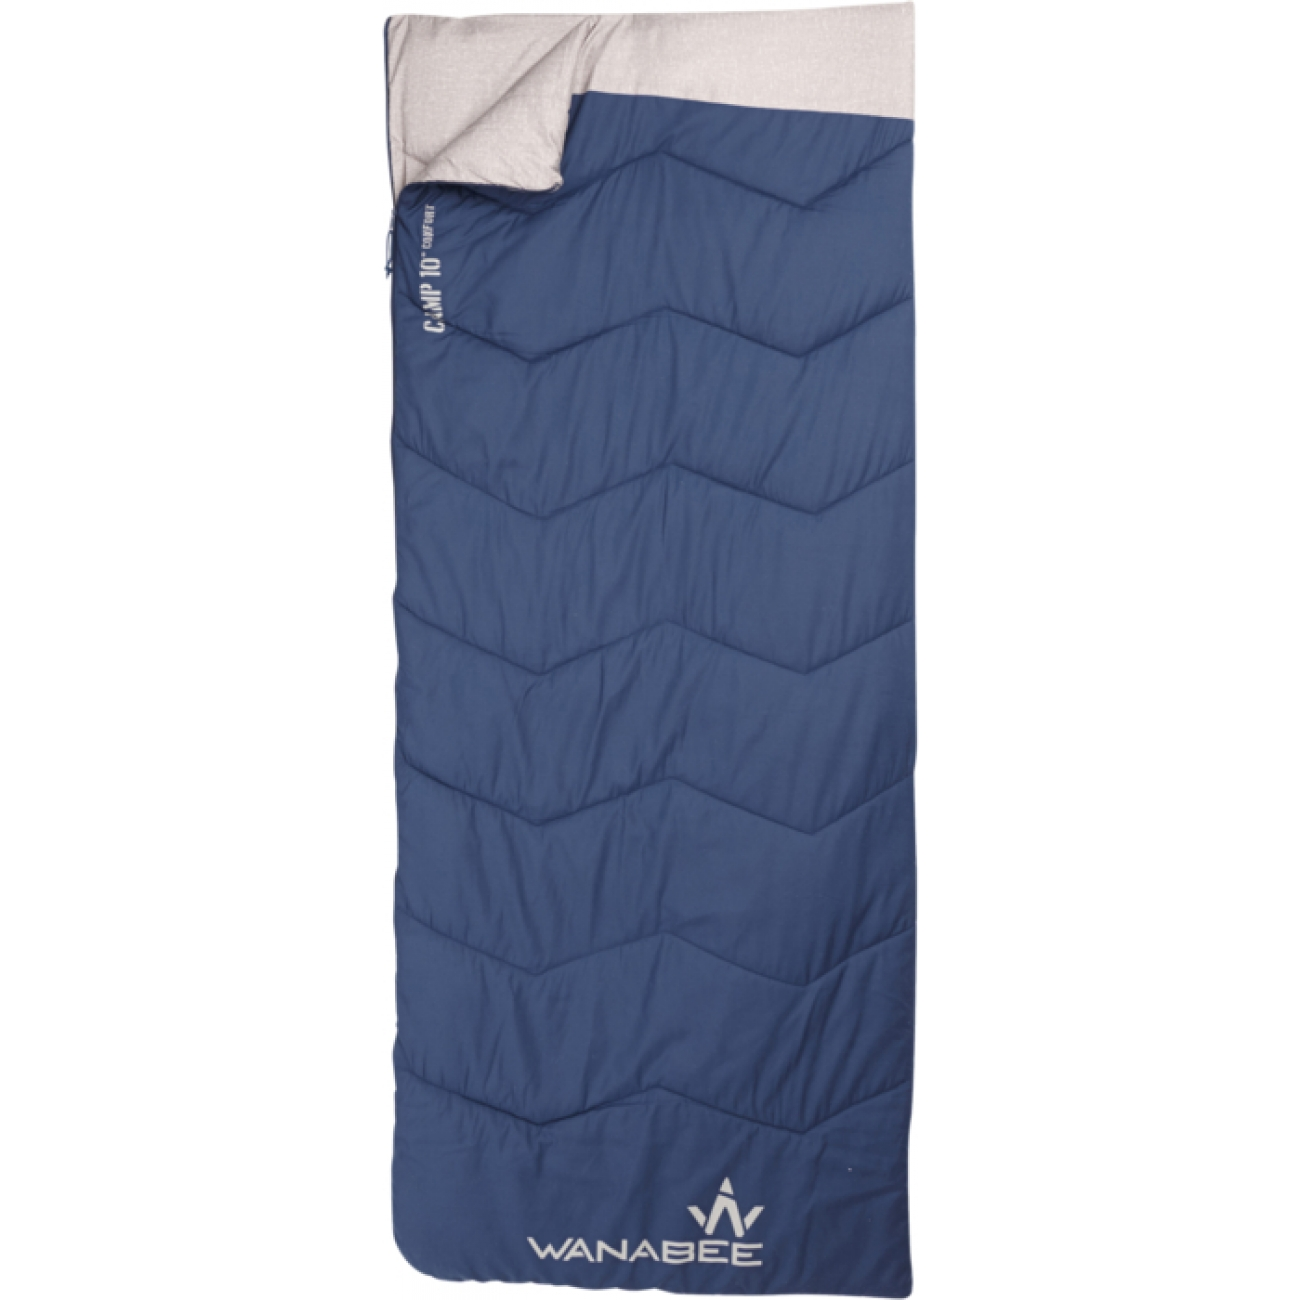 sac de couchage confort - 10